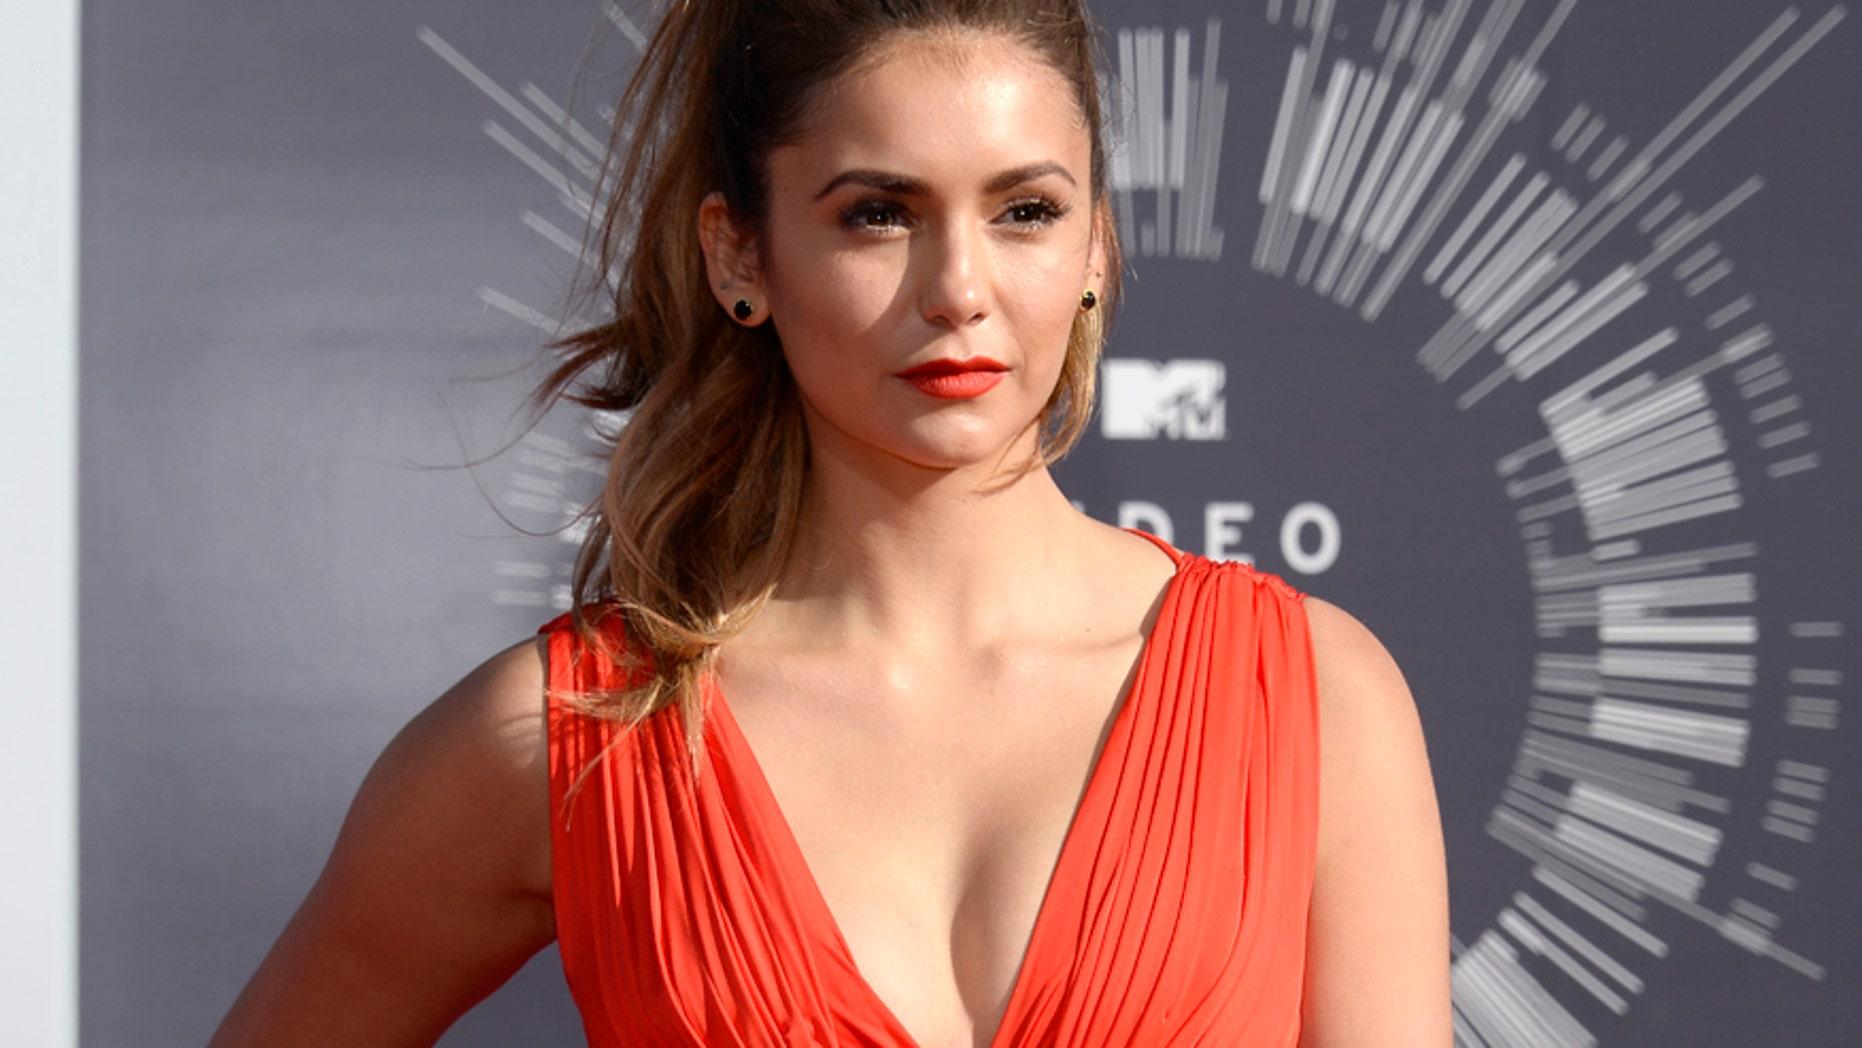 Nina Dobrev arrives at the 2014 MTV Music Video Awards in Inglewood, California August 24, 2014.